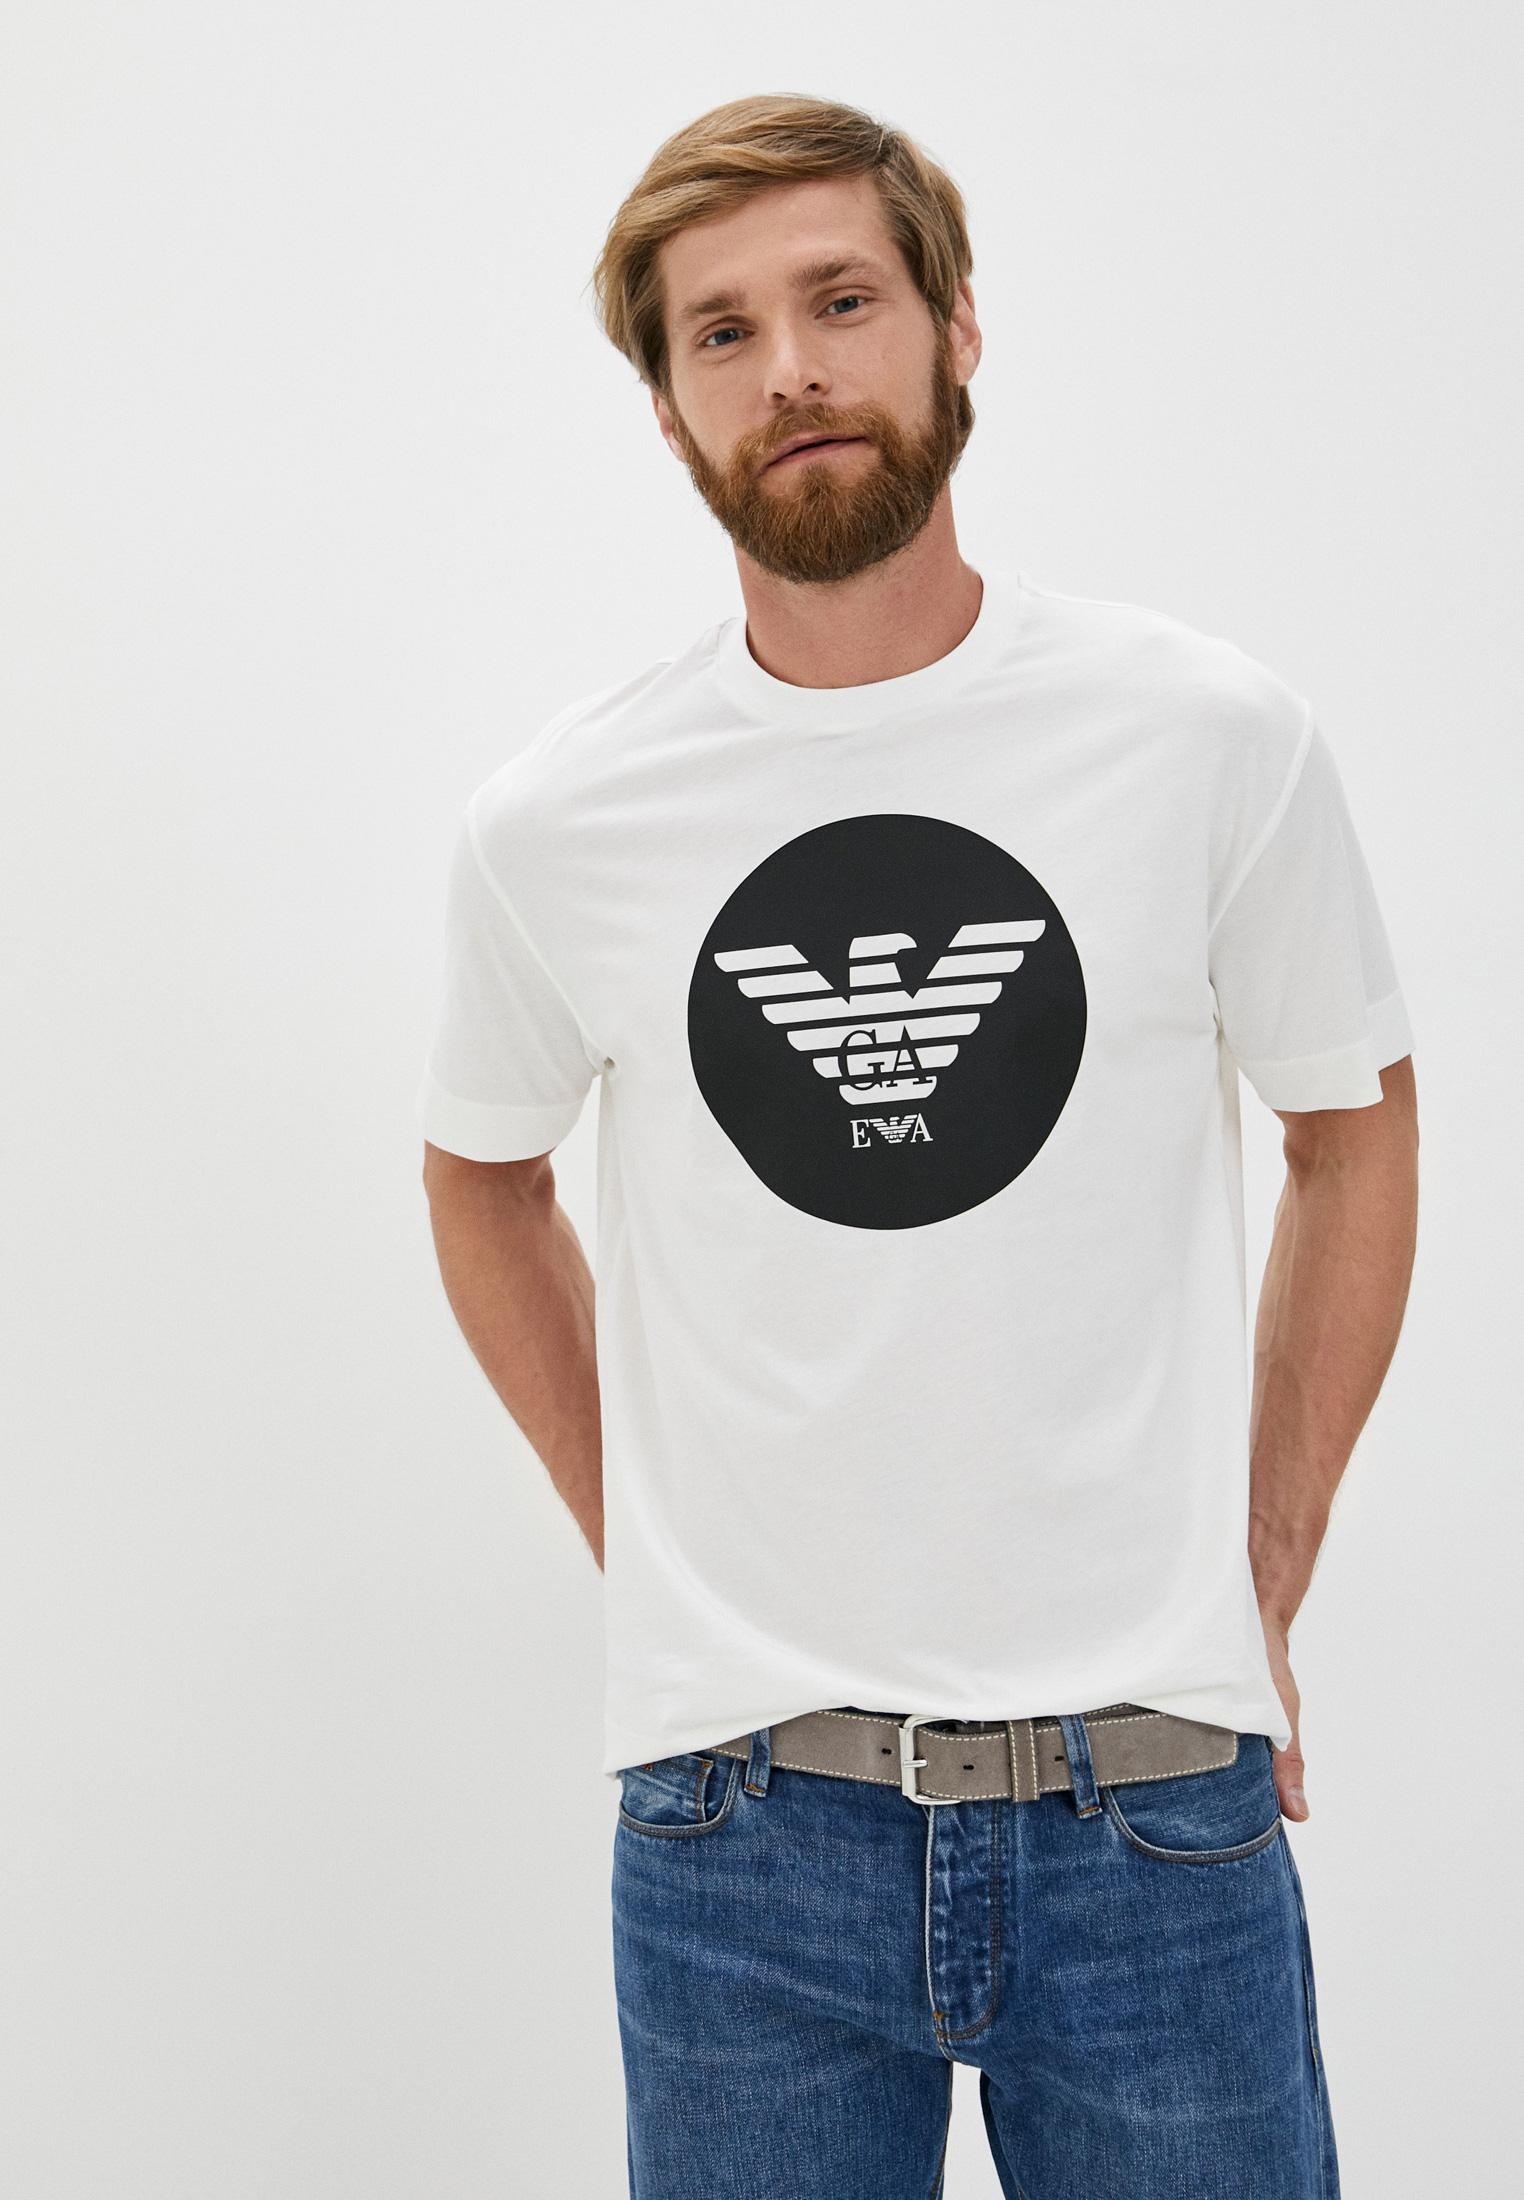 Мужская футболка Emporio Armani (Эмпорио Армани) 6h1t73 1jdxz